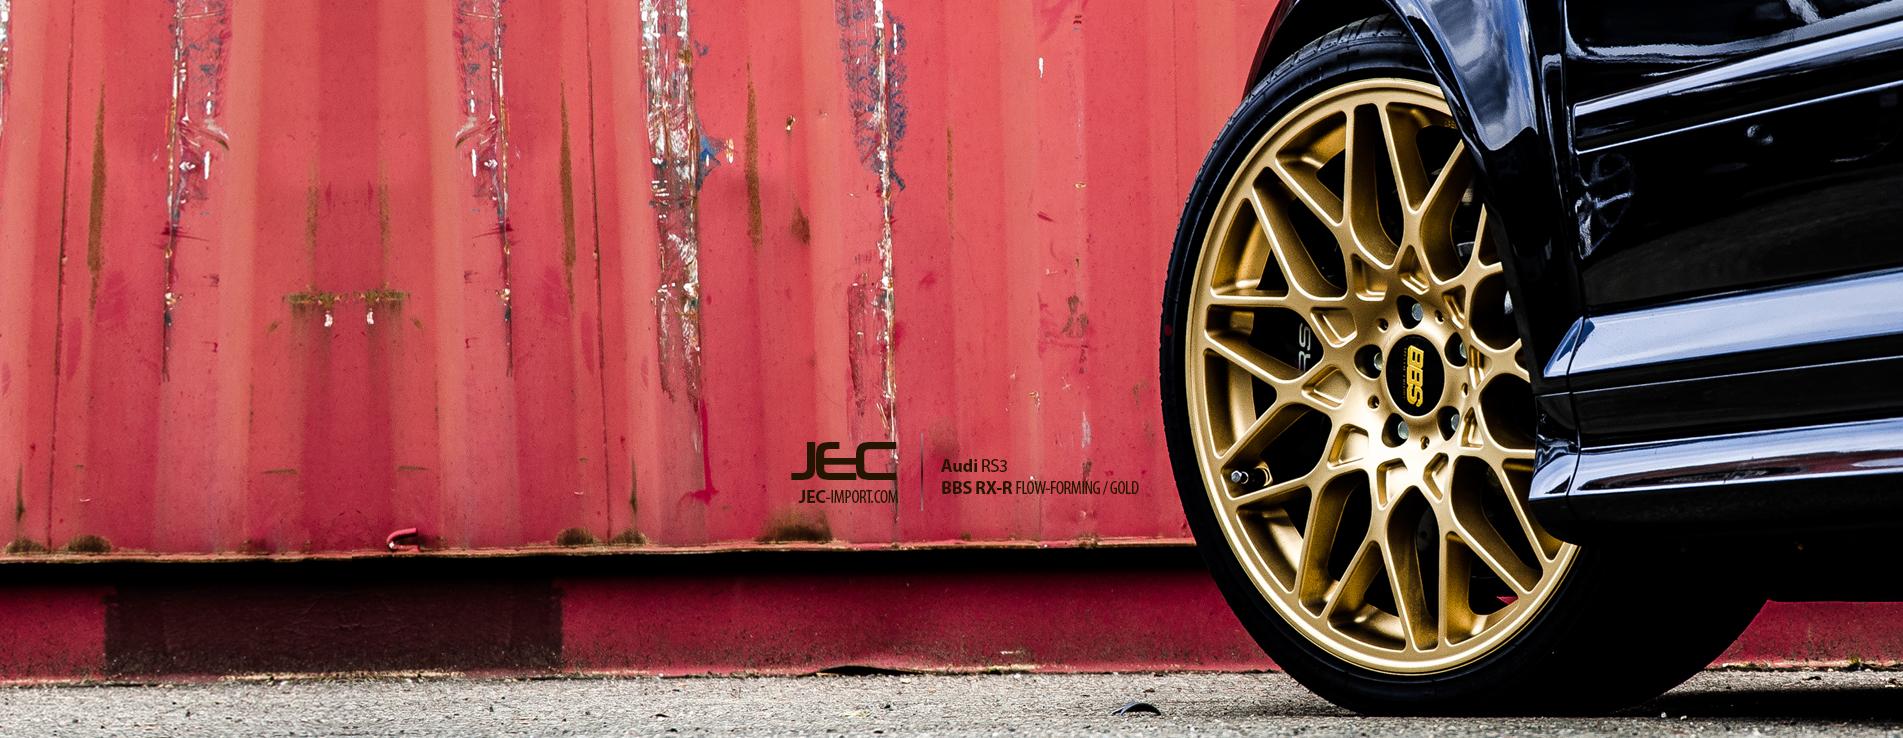 Audi RS3 Jec Import Edition